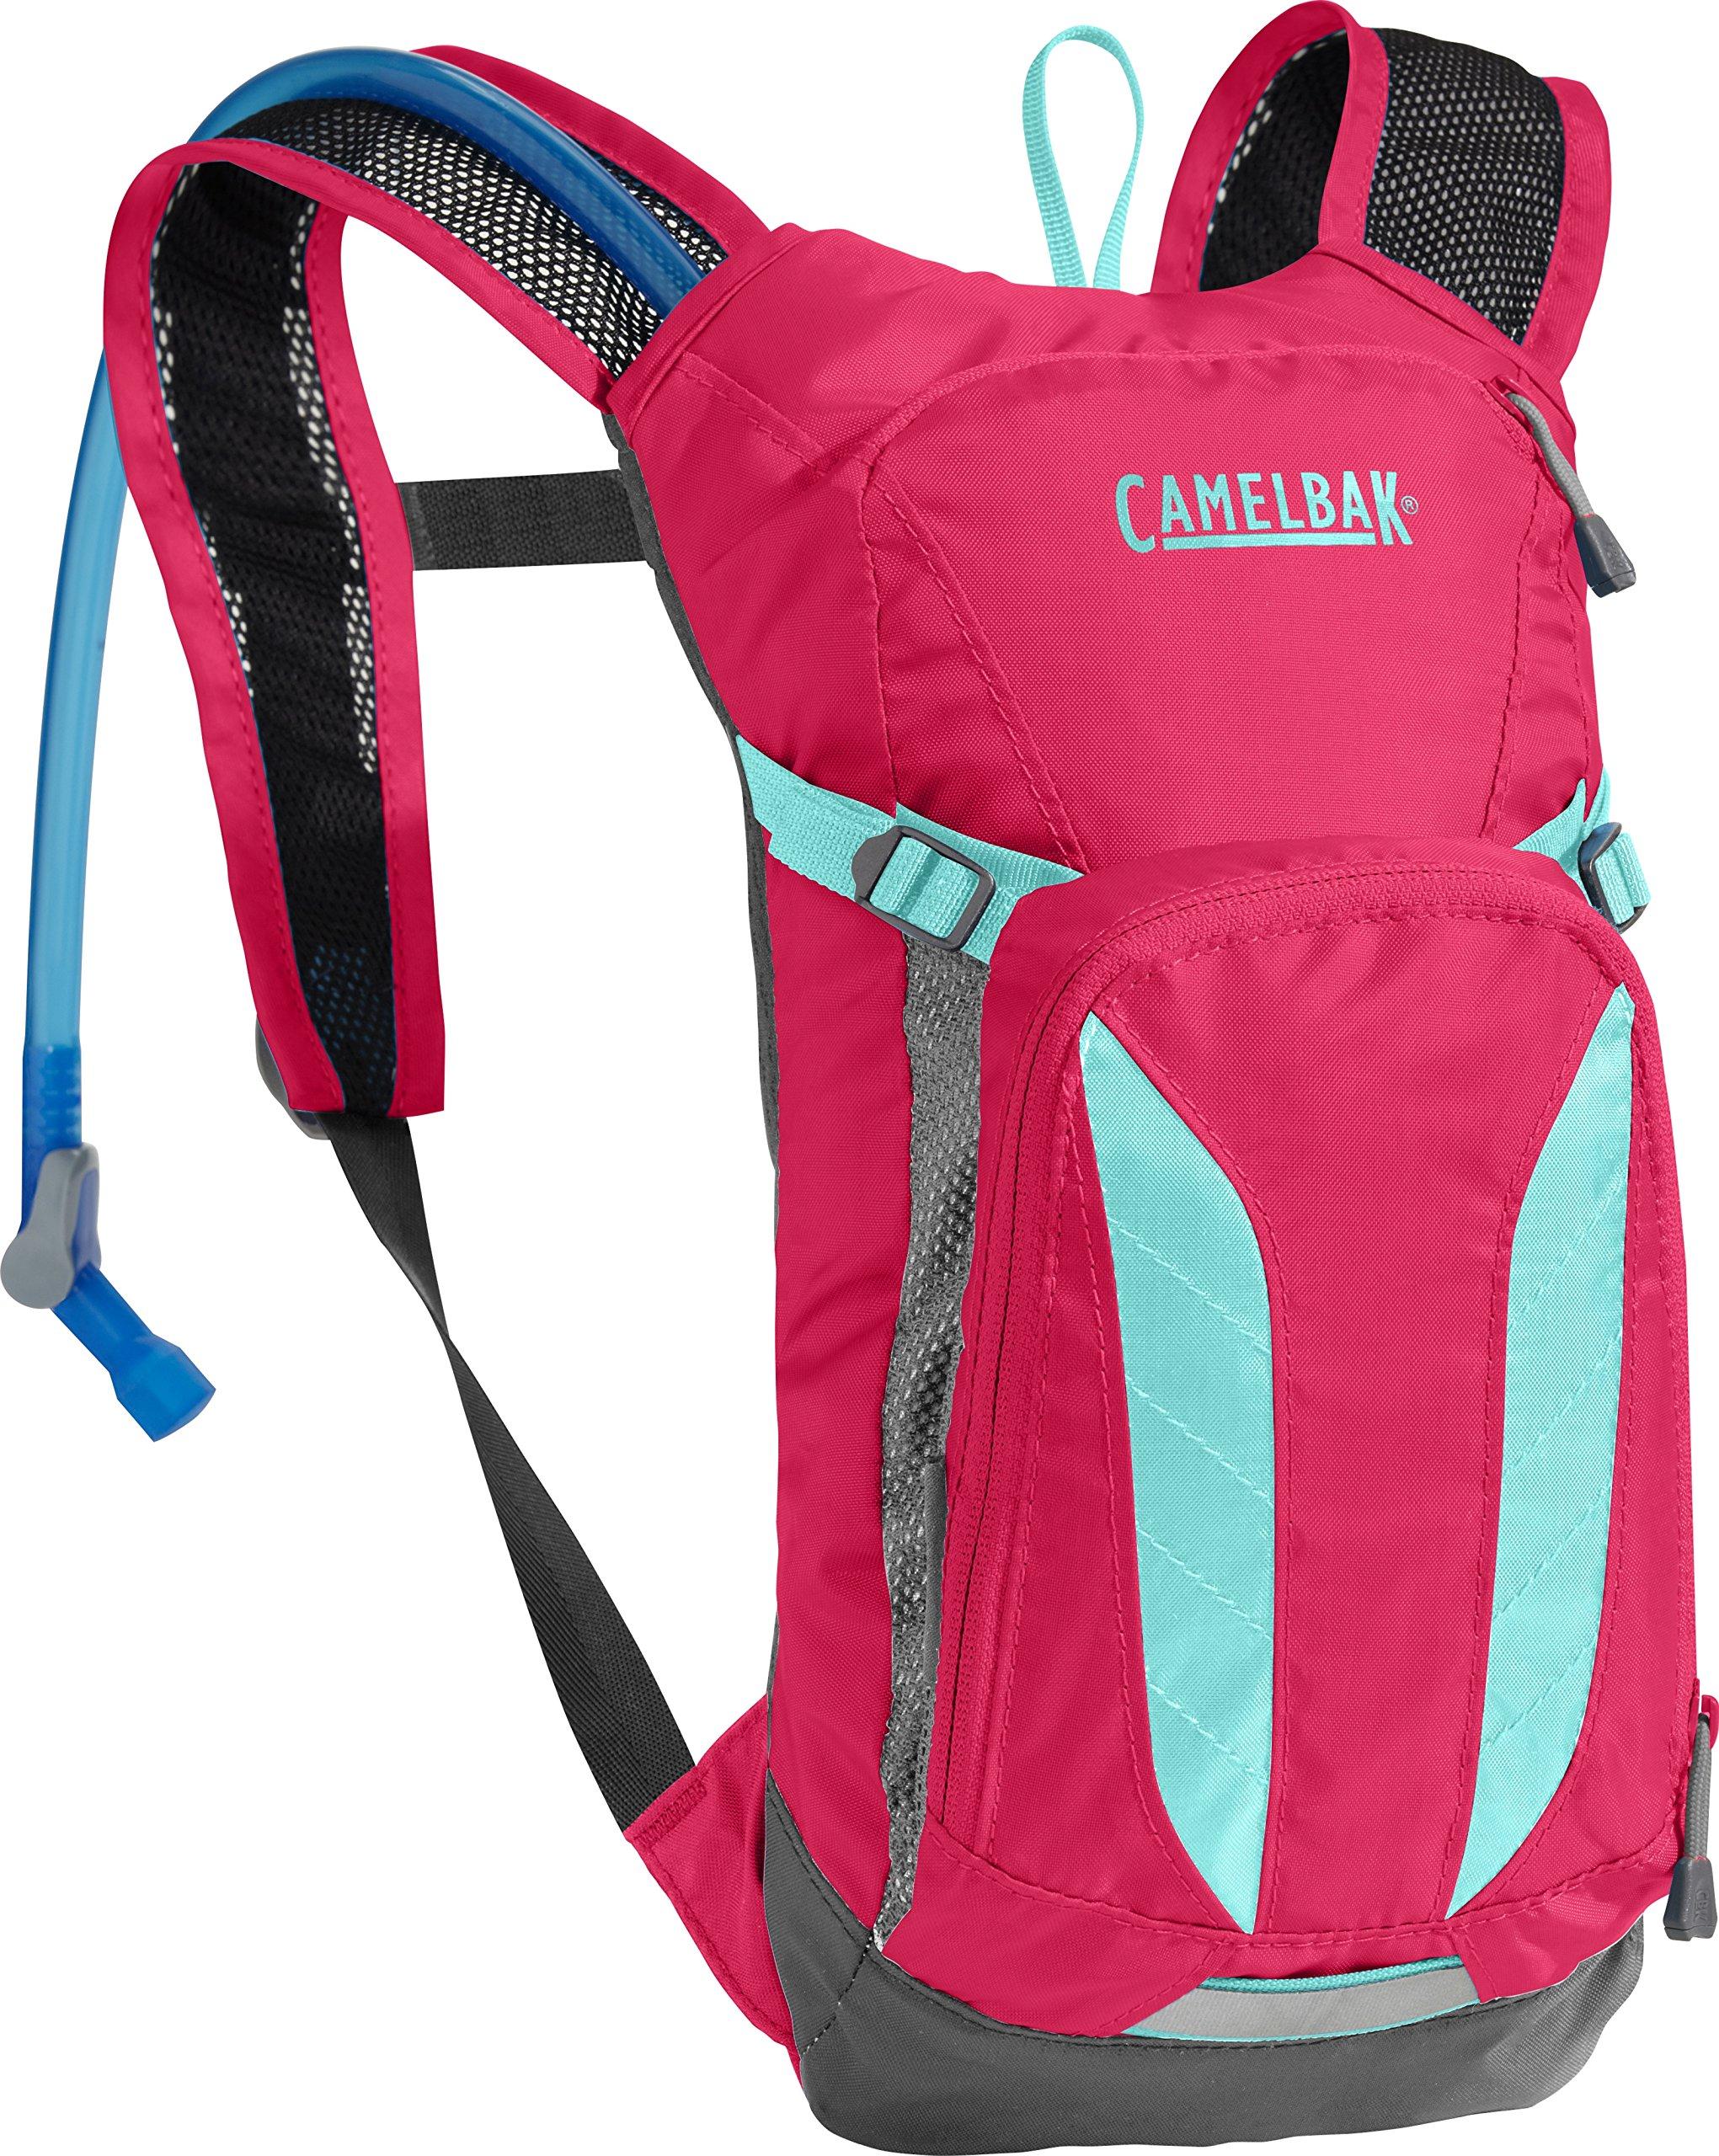 CamelBak Kids Mini M.U.L.E. Crux Reservoir Hydration Pack, Azalea/Aruba Blue, 1.5 L/50 oz by CamelBak